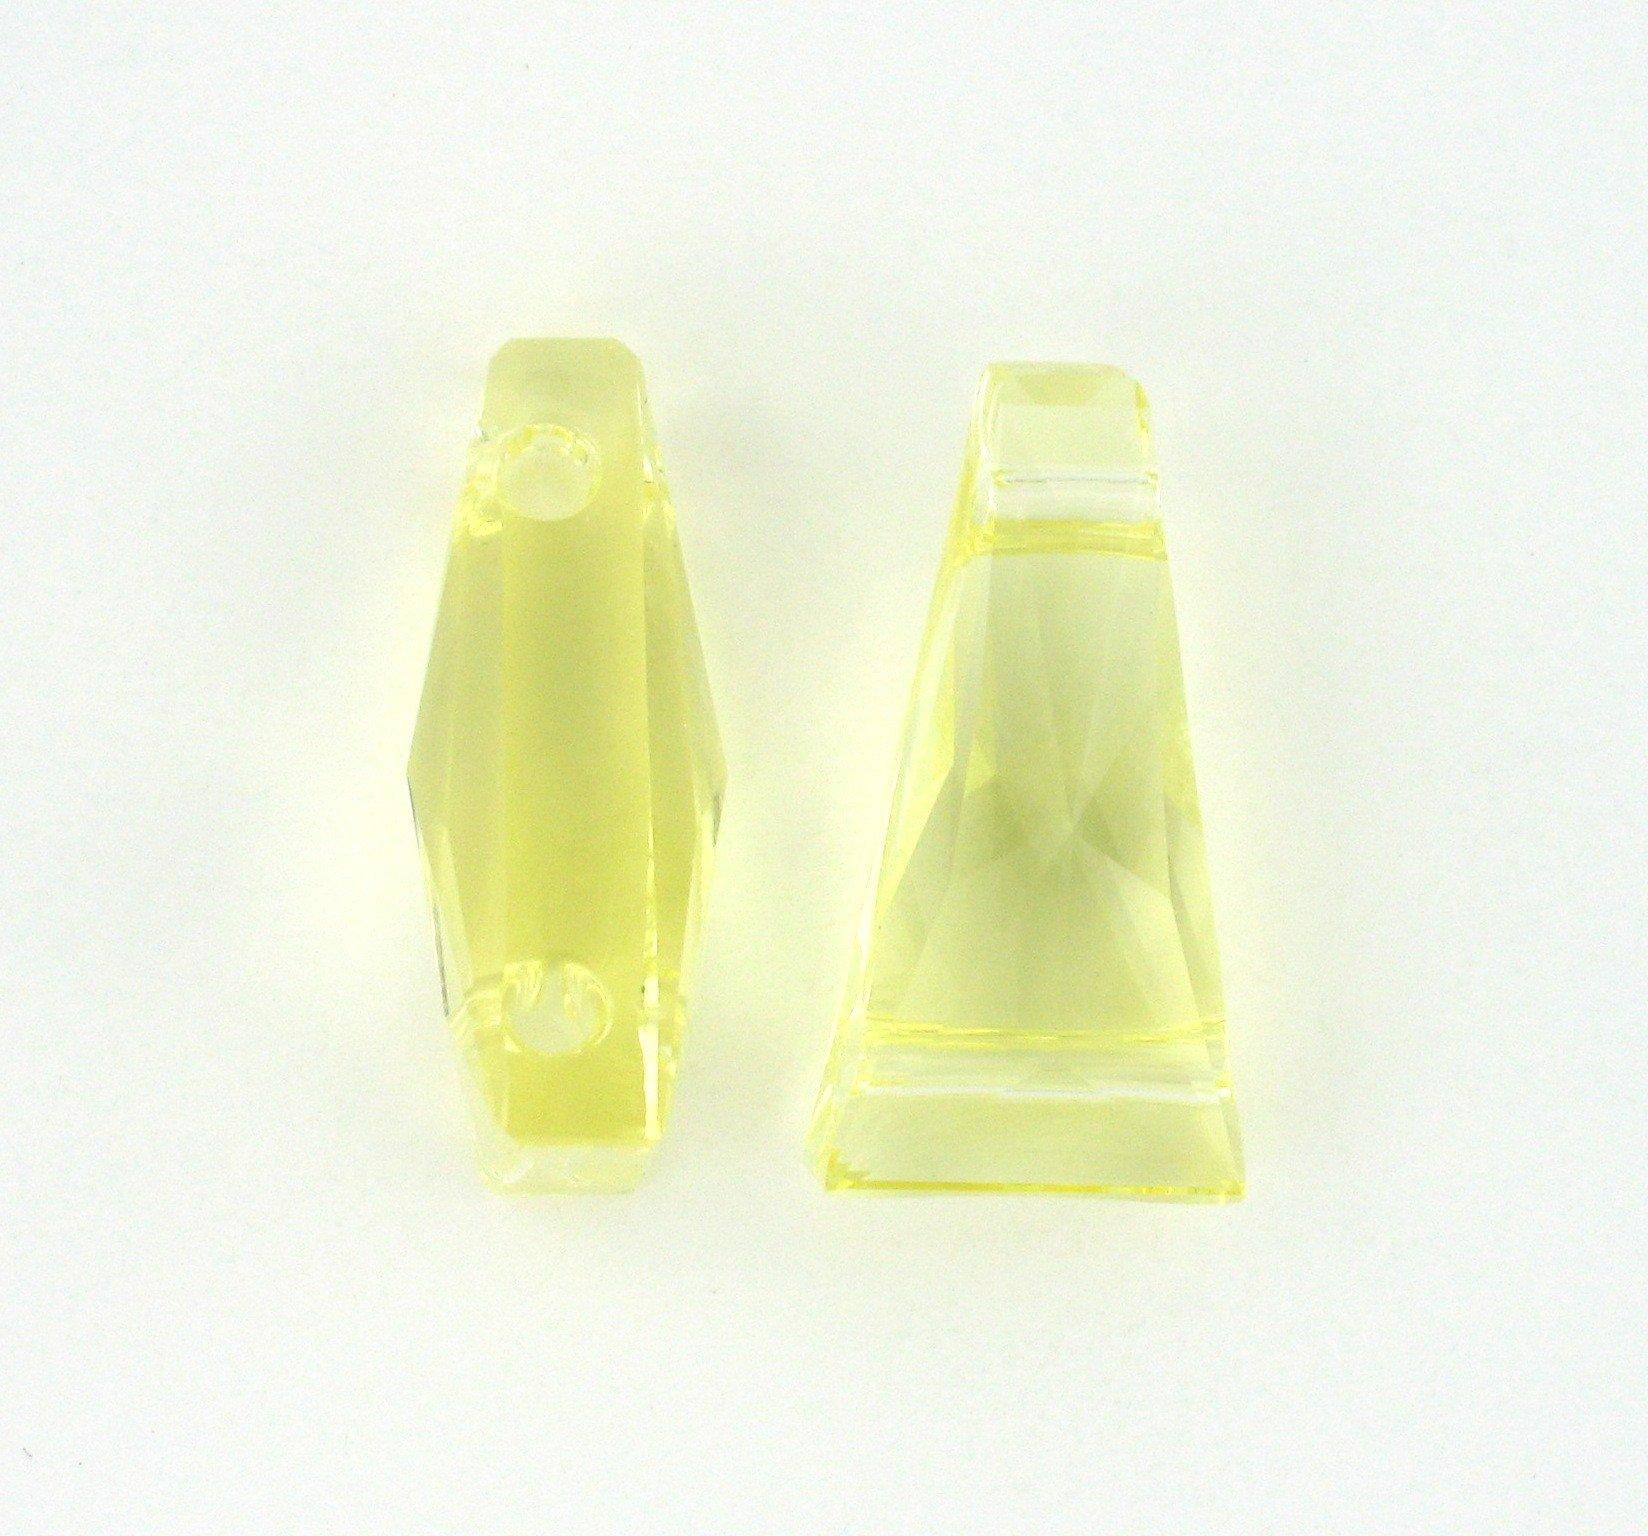 1xSwarovski ® jonquil 13x7mm Keystone Bead